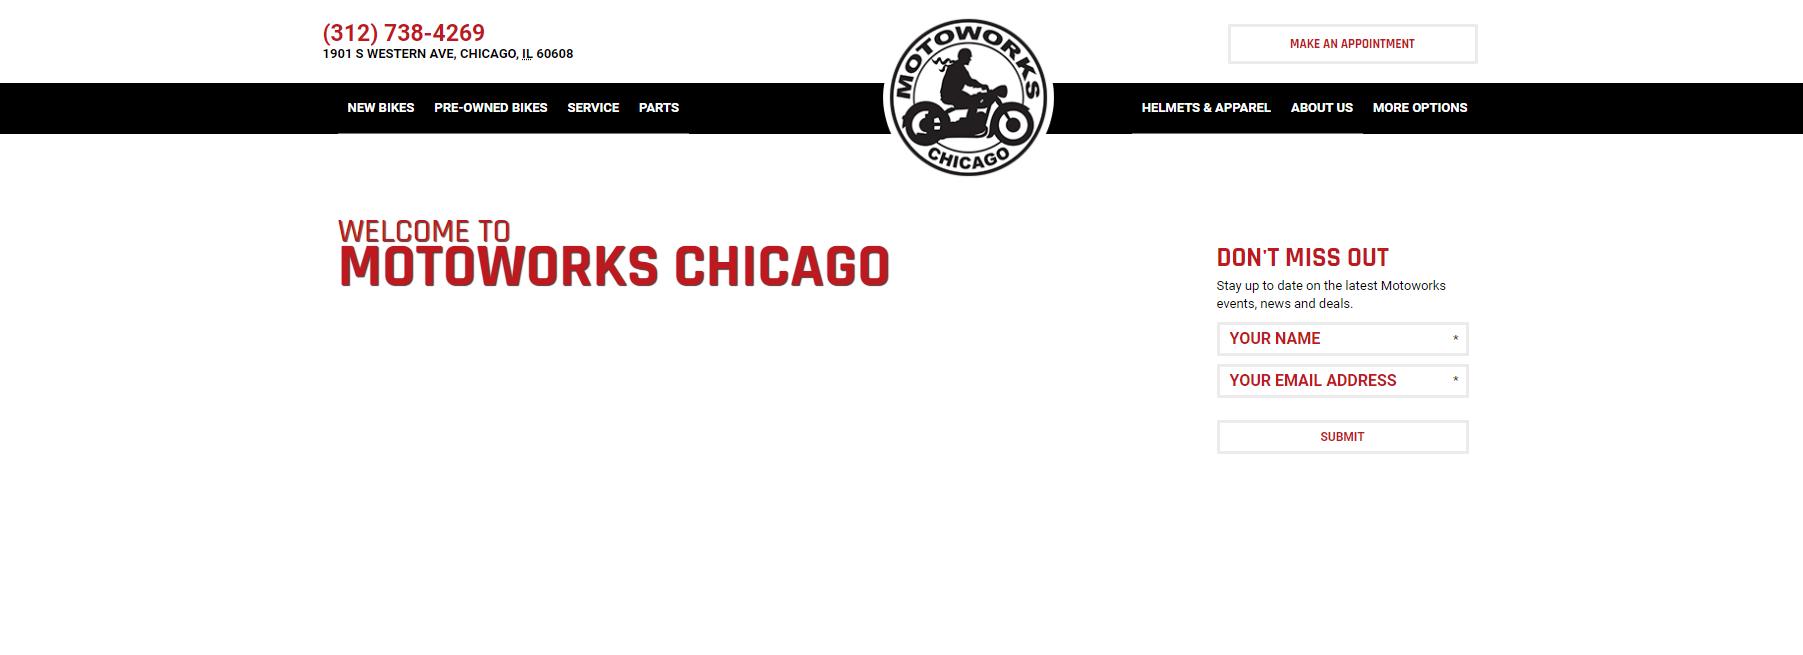 Motoworks Chicago